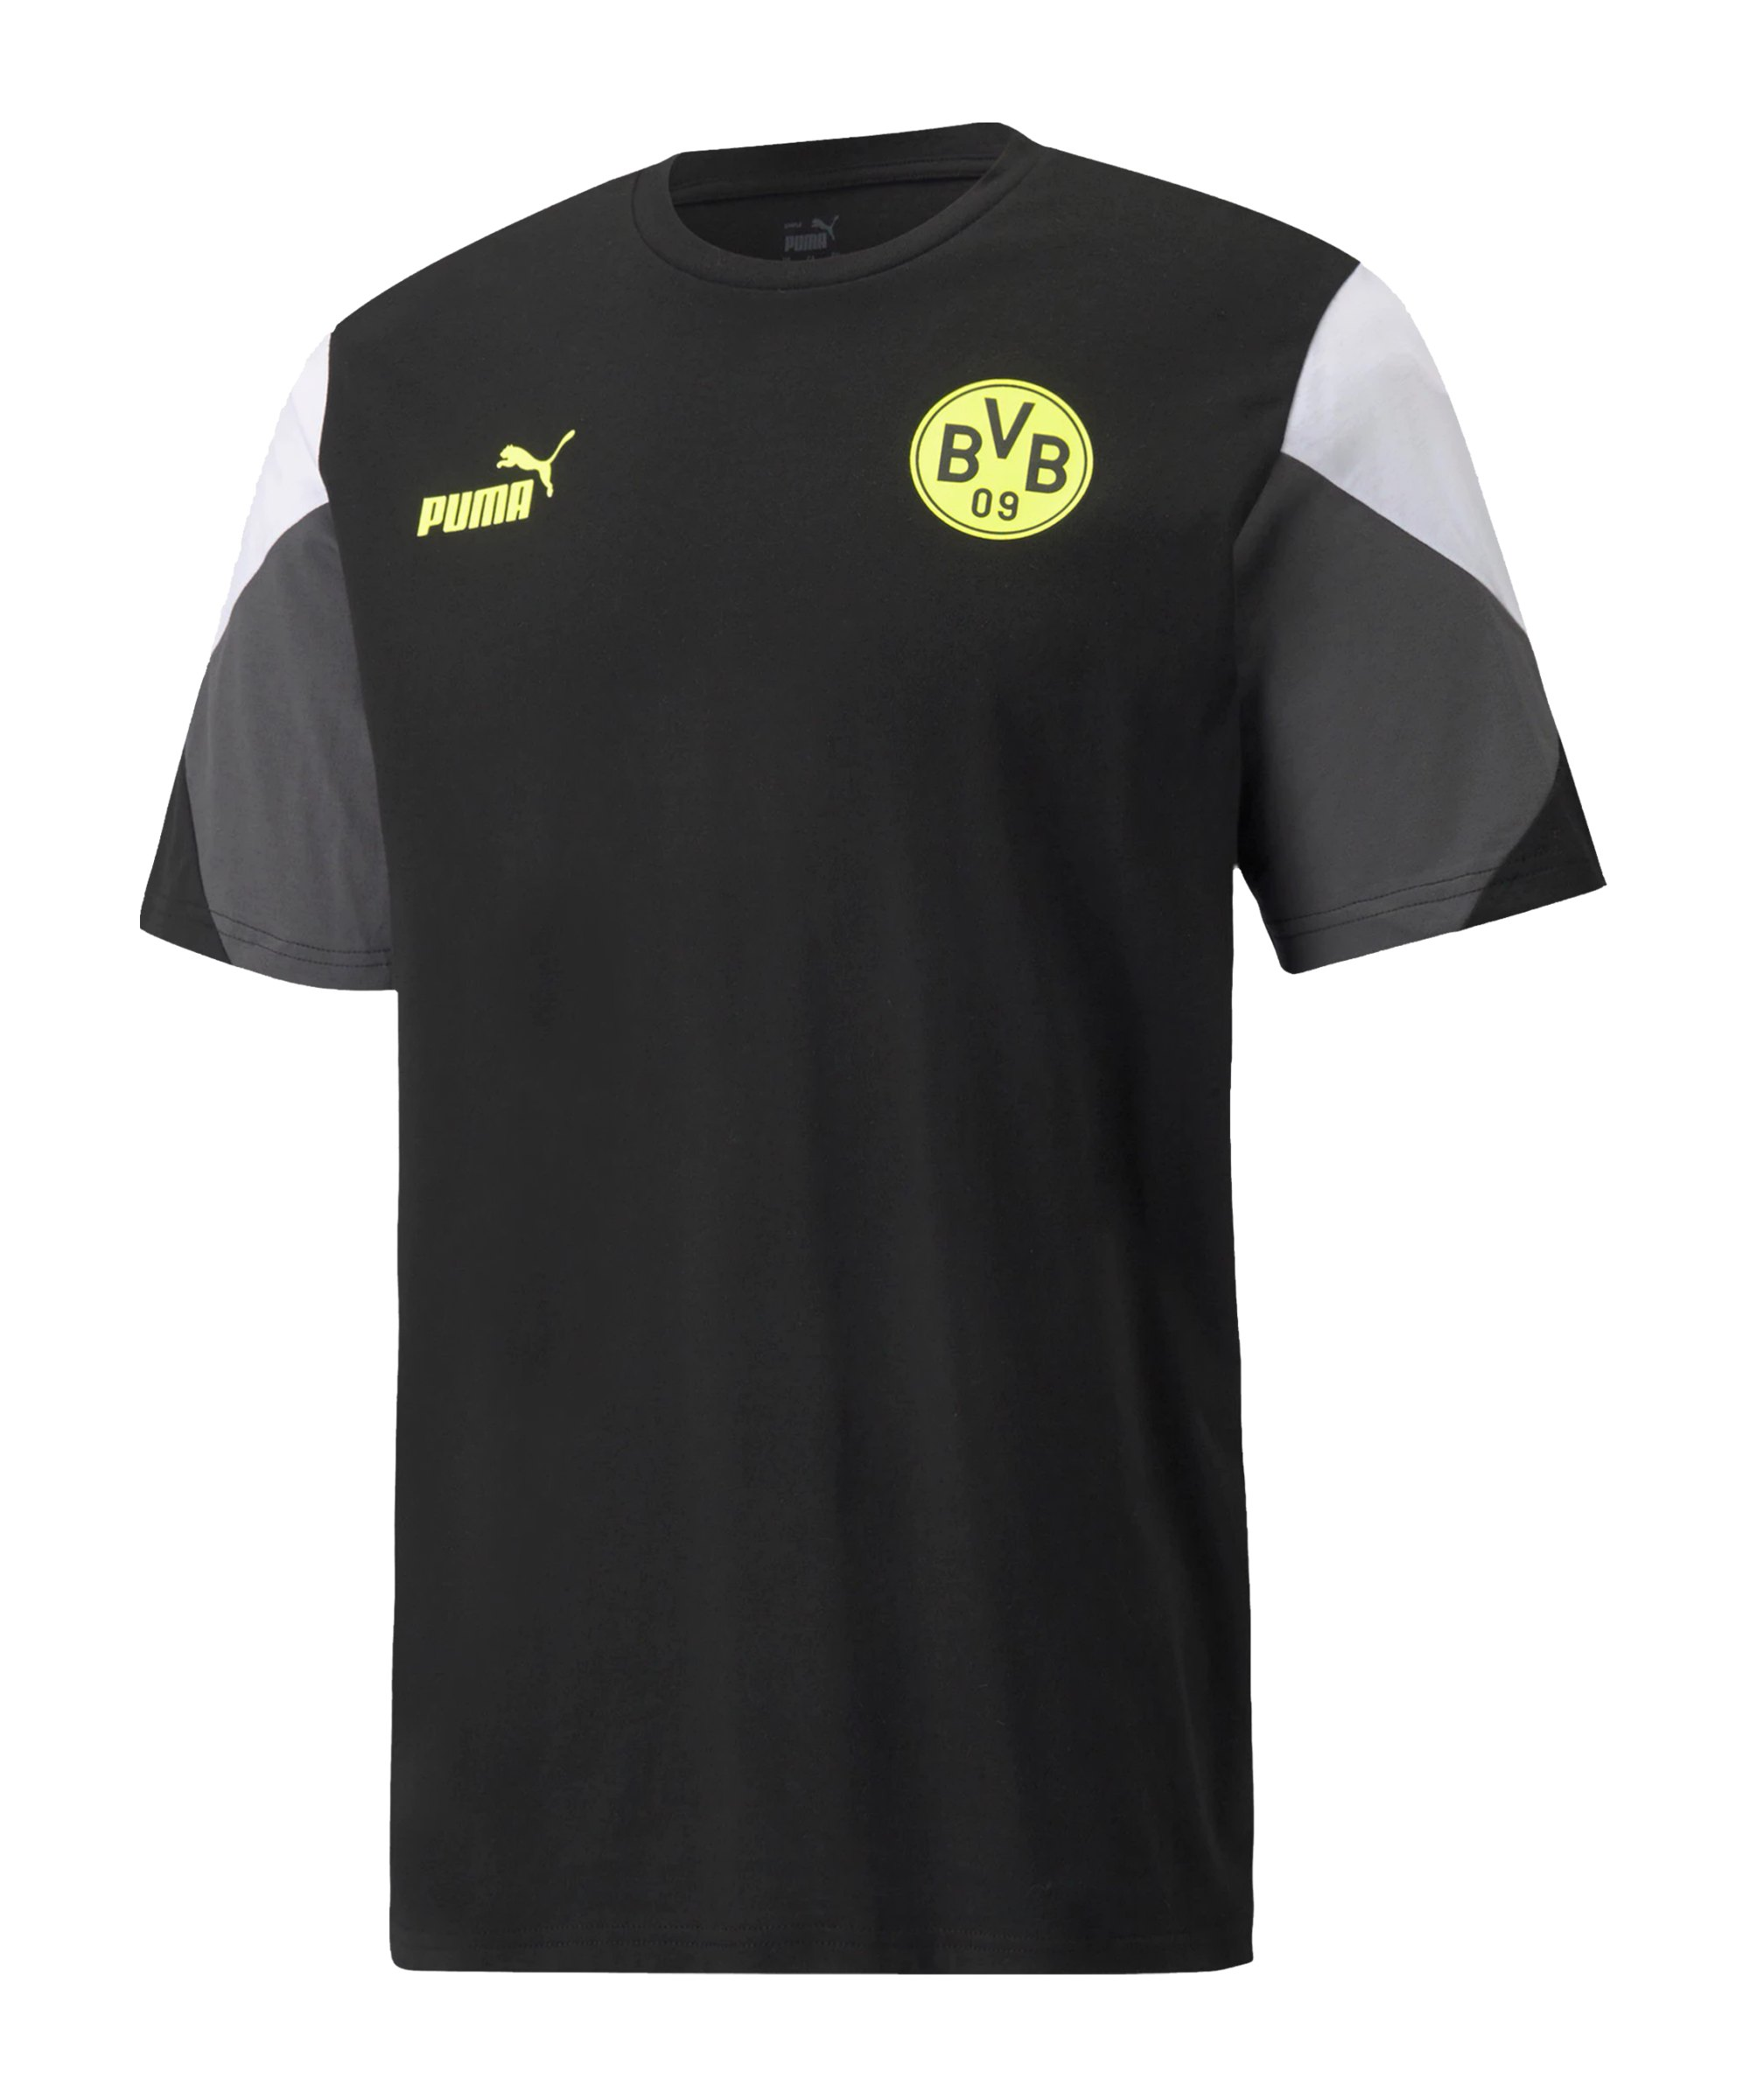 PUMA BVB Dortmund FtblCulture T-Shirt Schwarz F05 - schwarz